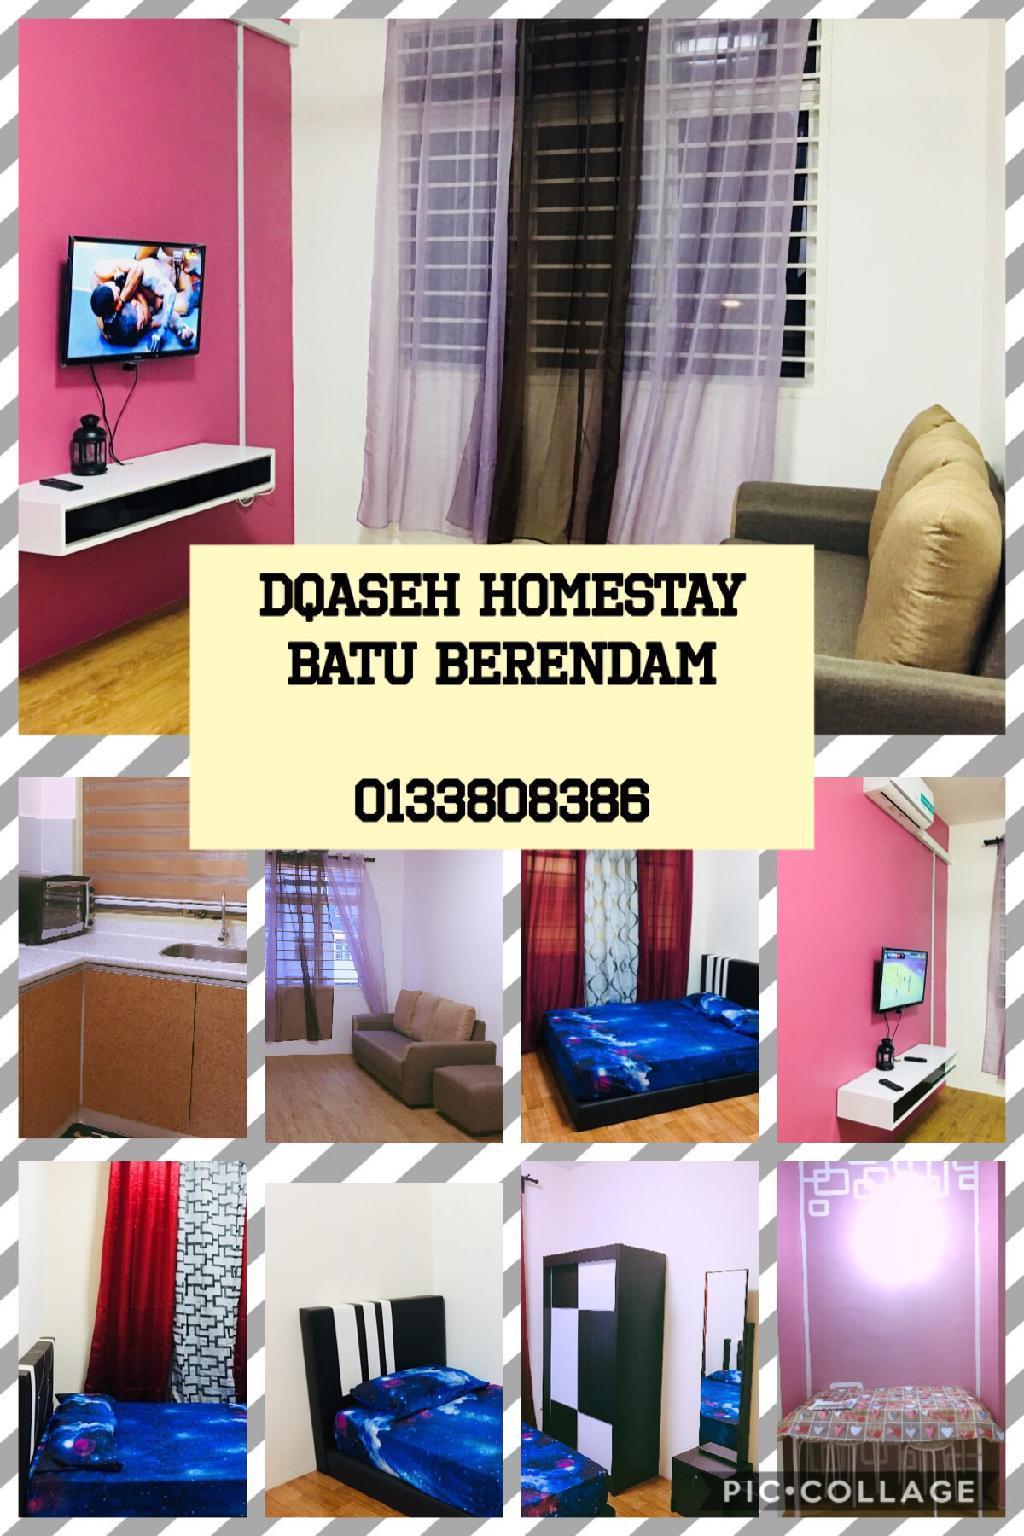 Malacca DQaseh Homestay